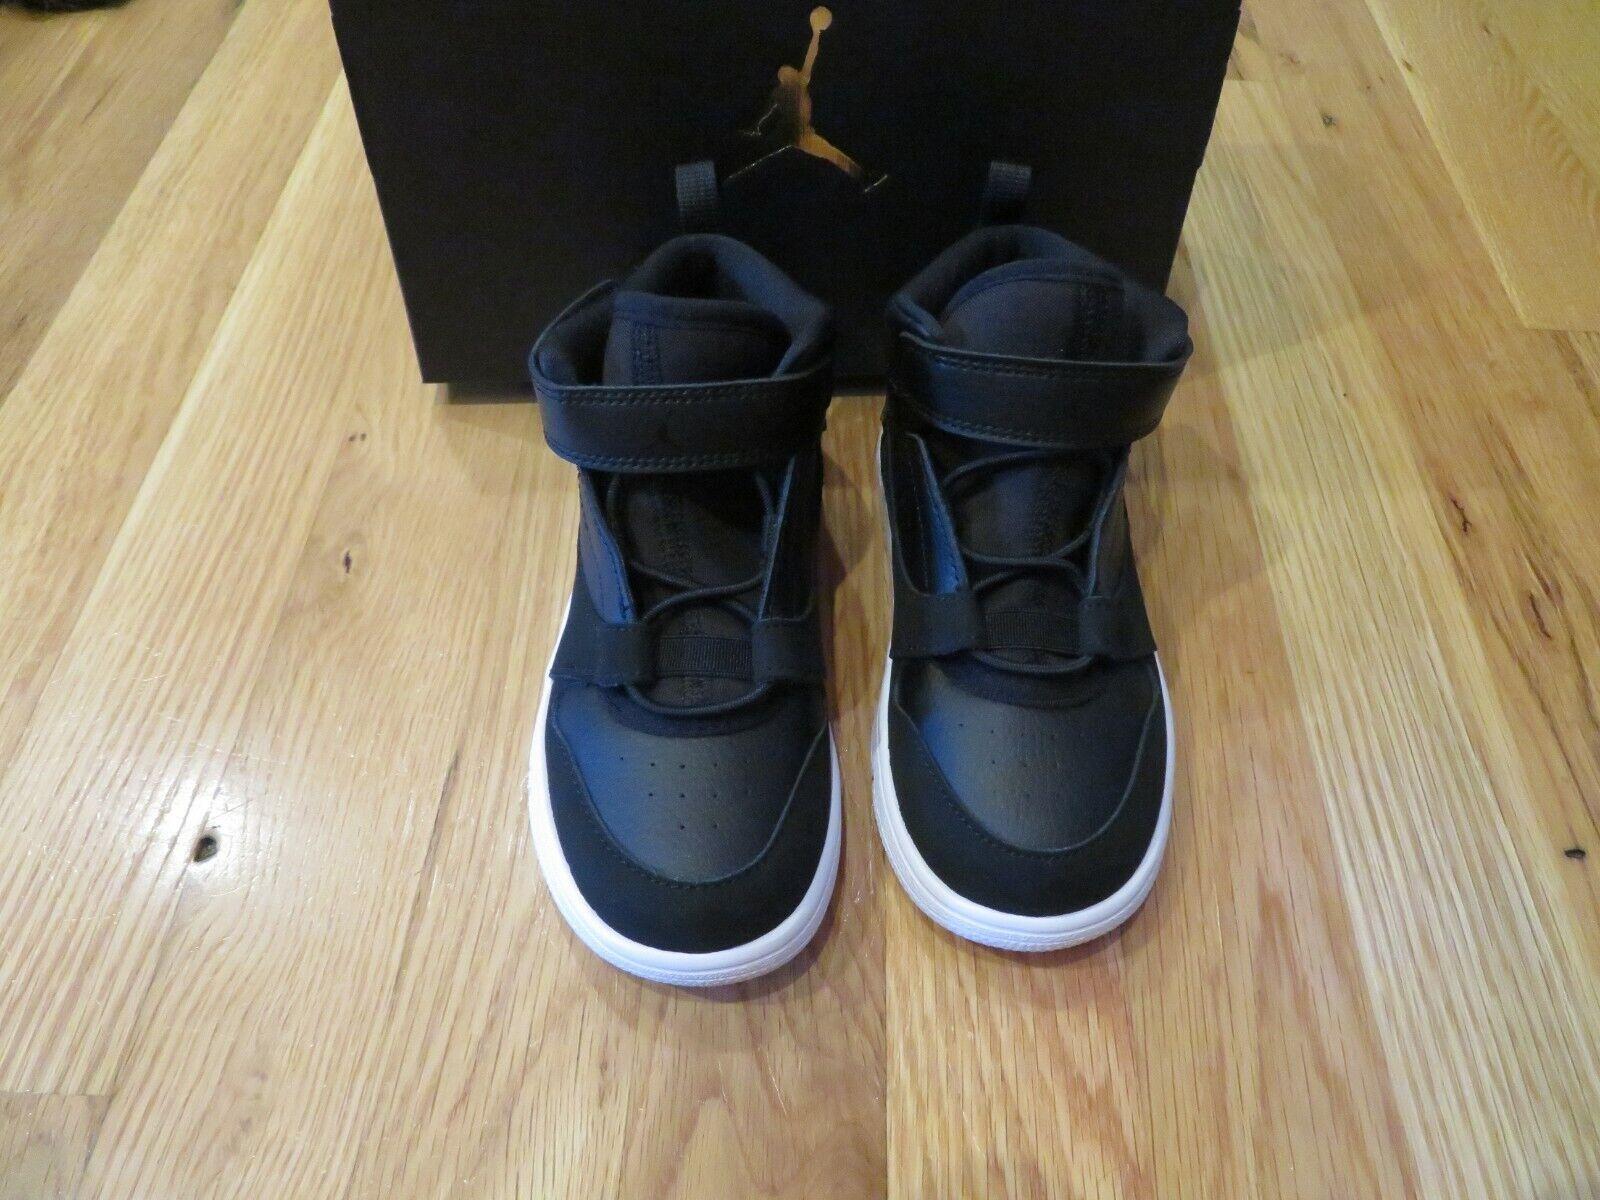 NWT Toddler Boys Black Nike Jordan Fadeaway Tennis Shoes, Si